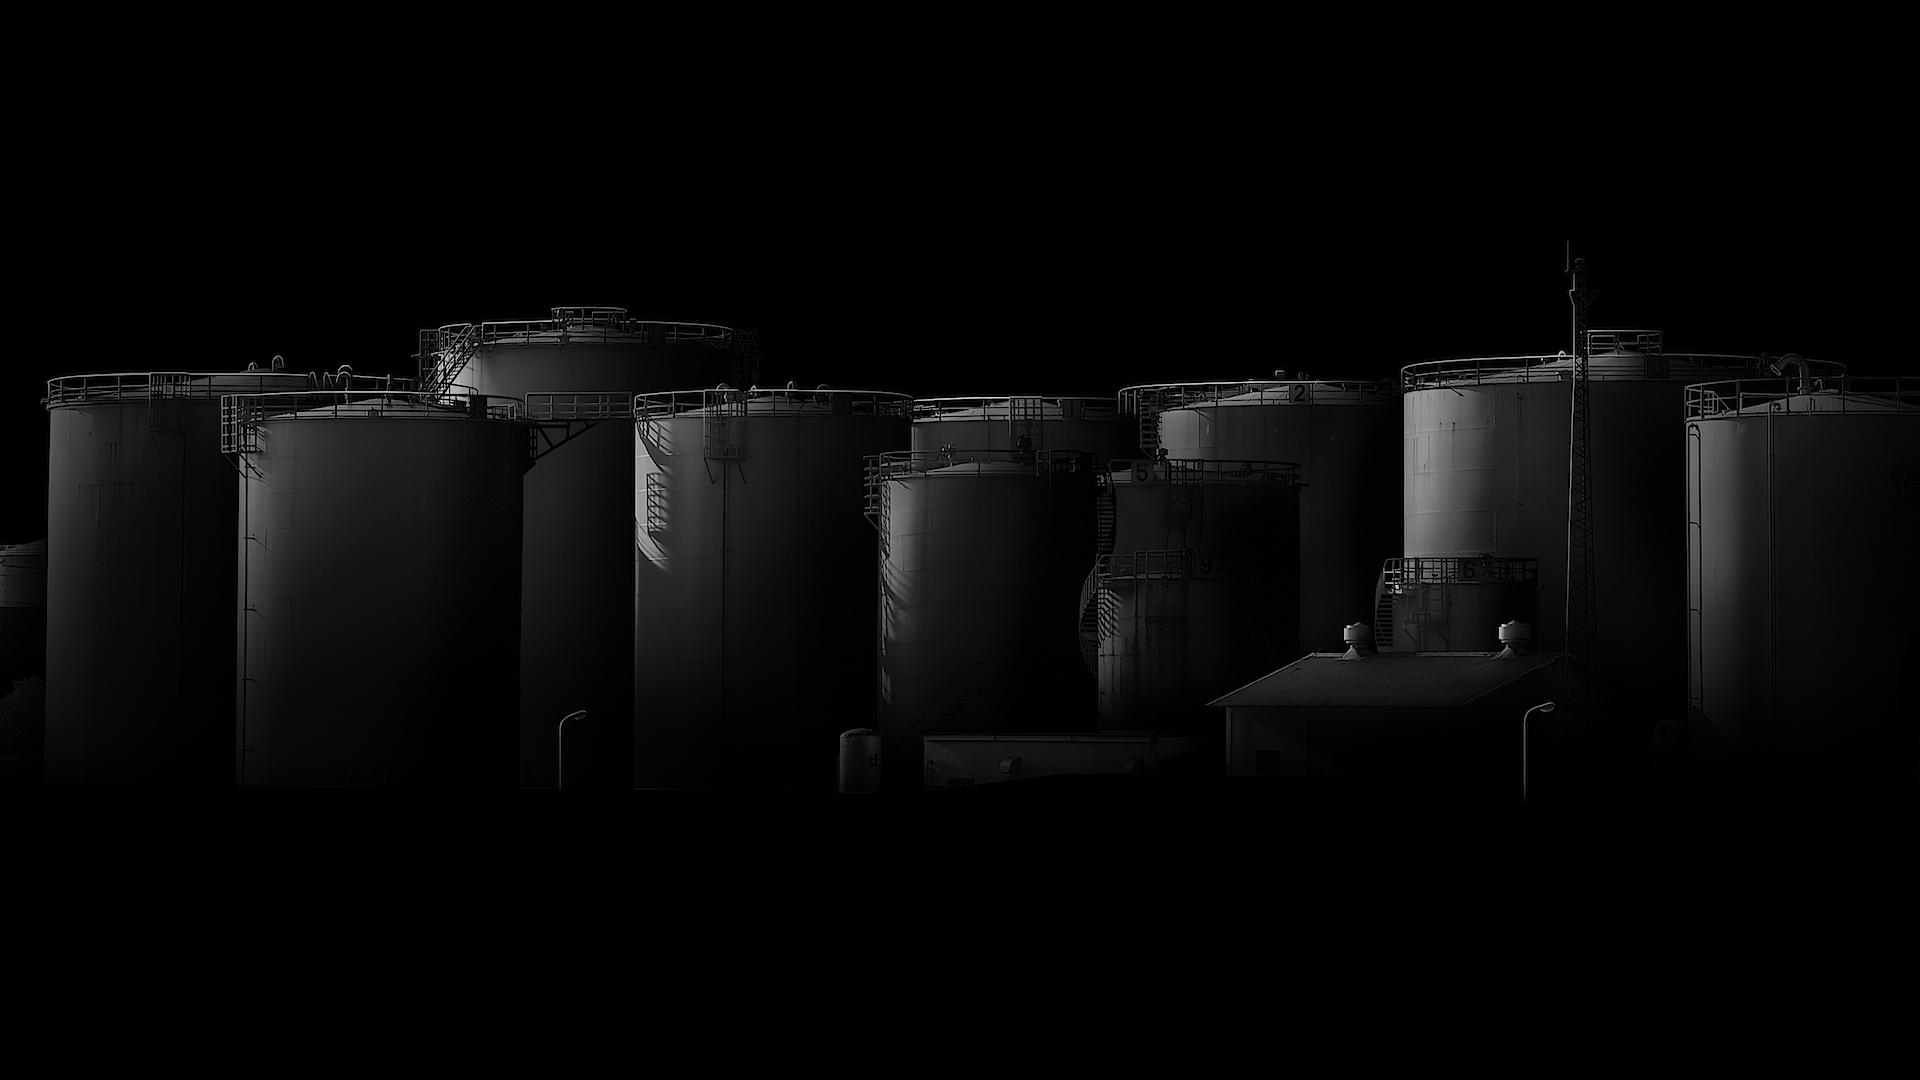 Wallpaper Japan Dark Night Architecture Shadow Tank Stairs